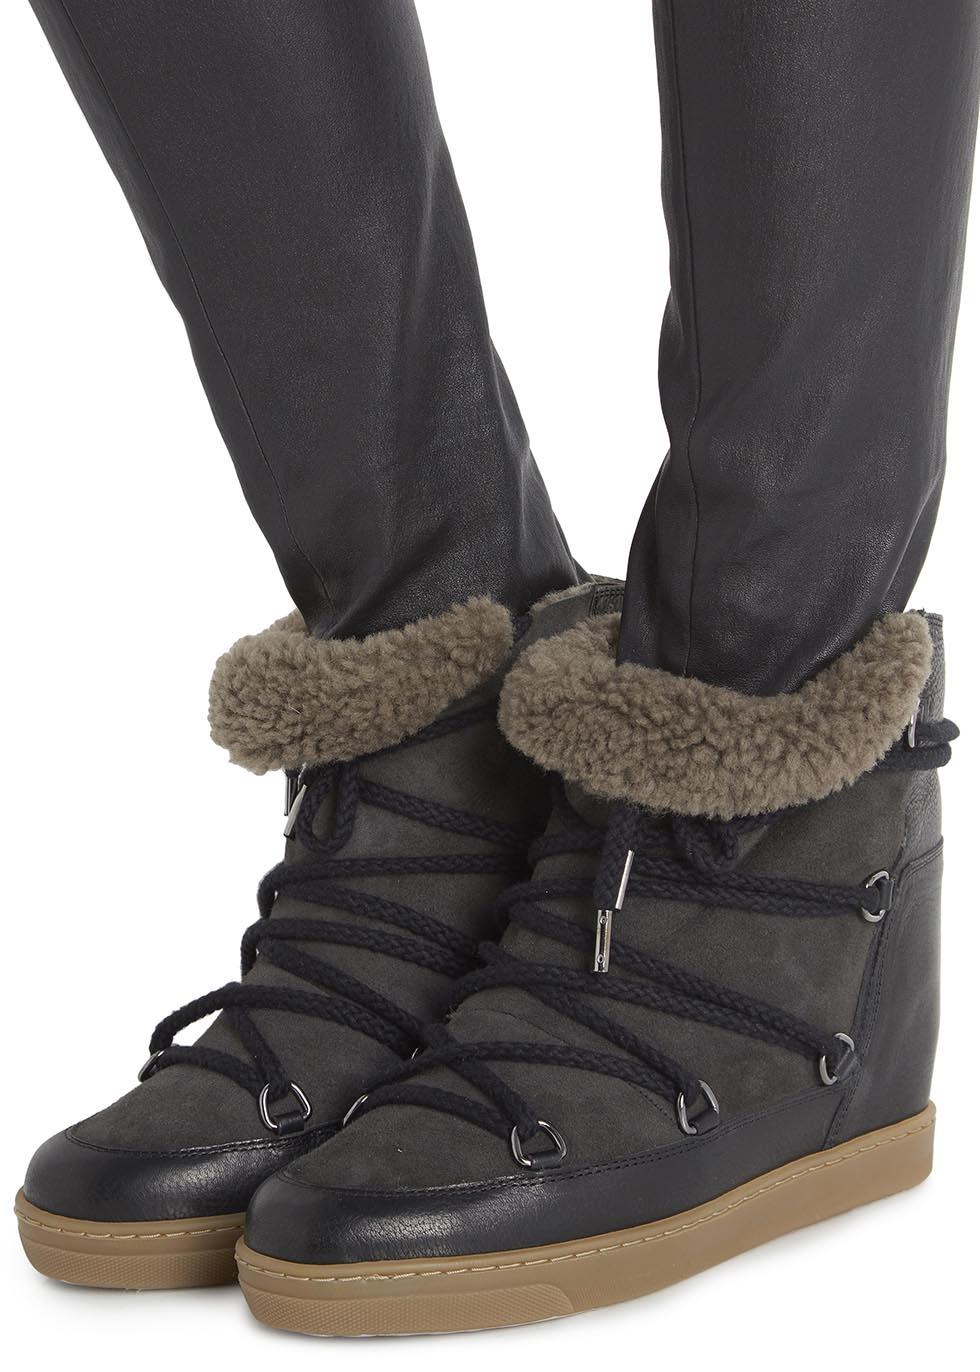 isabel marant nowles snow boot in black lyst. Black Bedroom Furniture Sets. Home Design Ideas